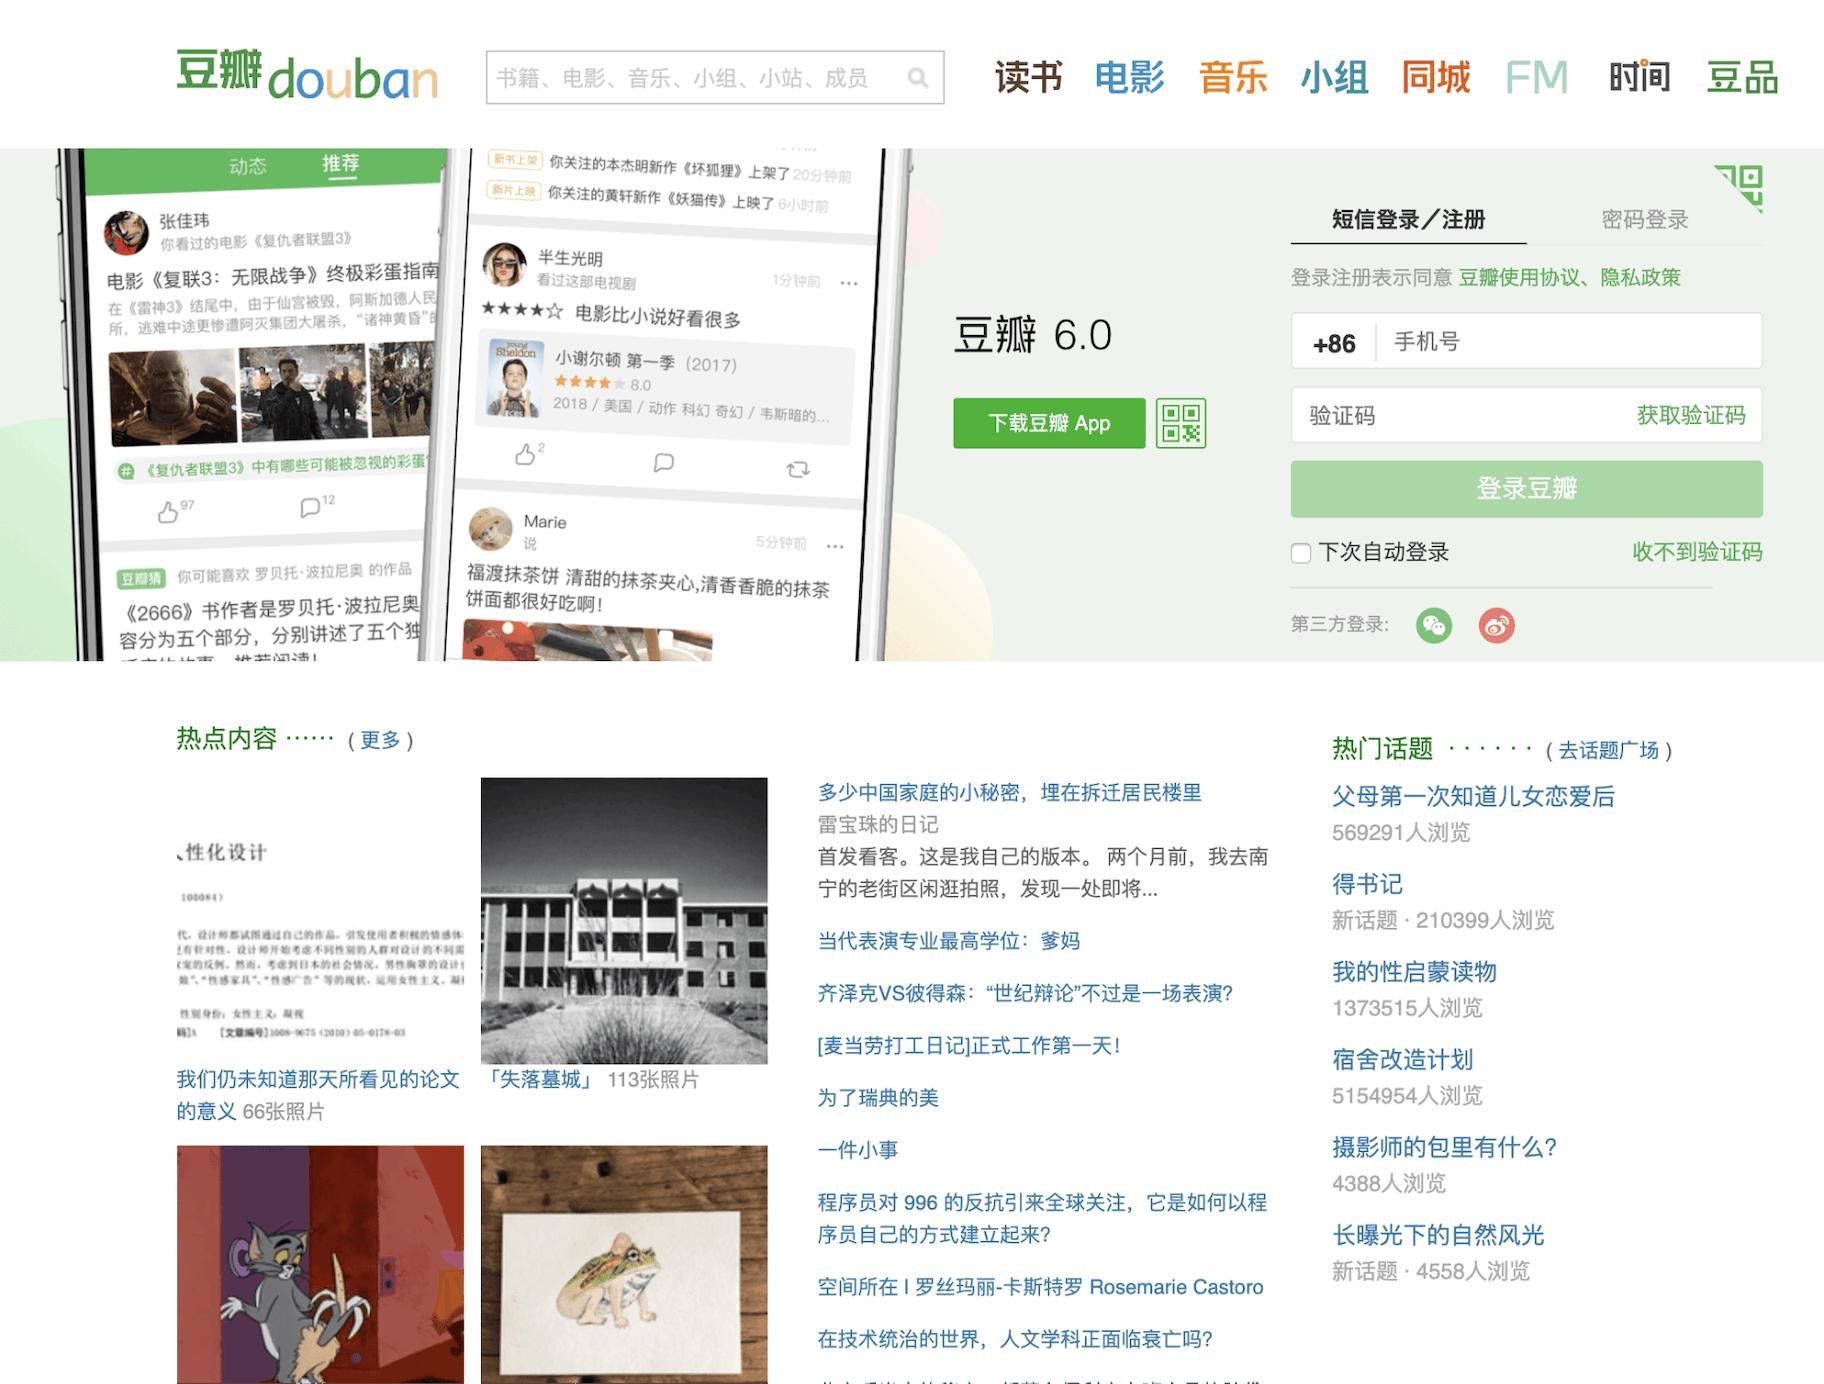 Douban Social Media Sites